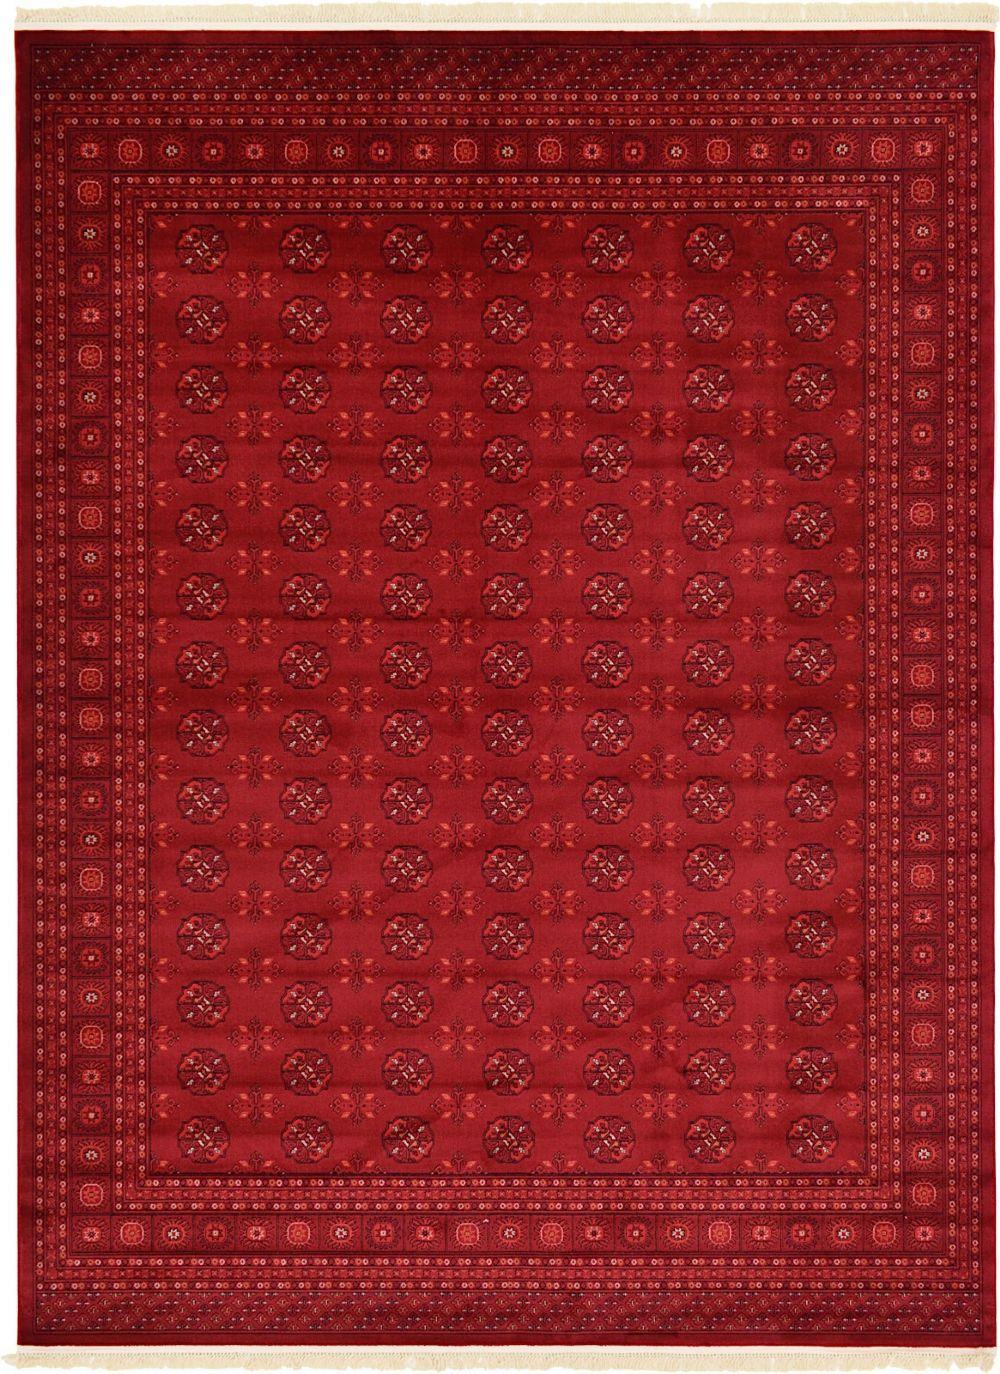 rugpal ottoman traditional area rug collection